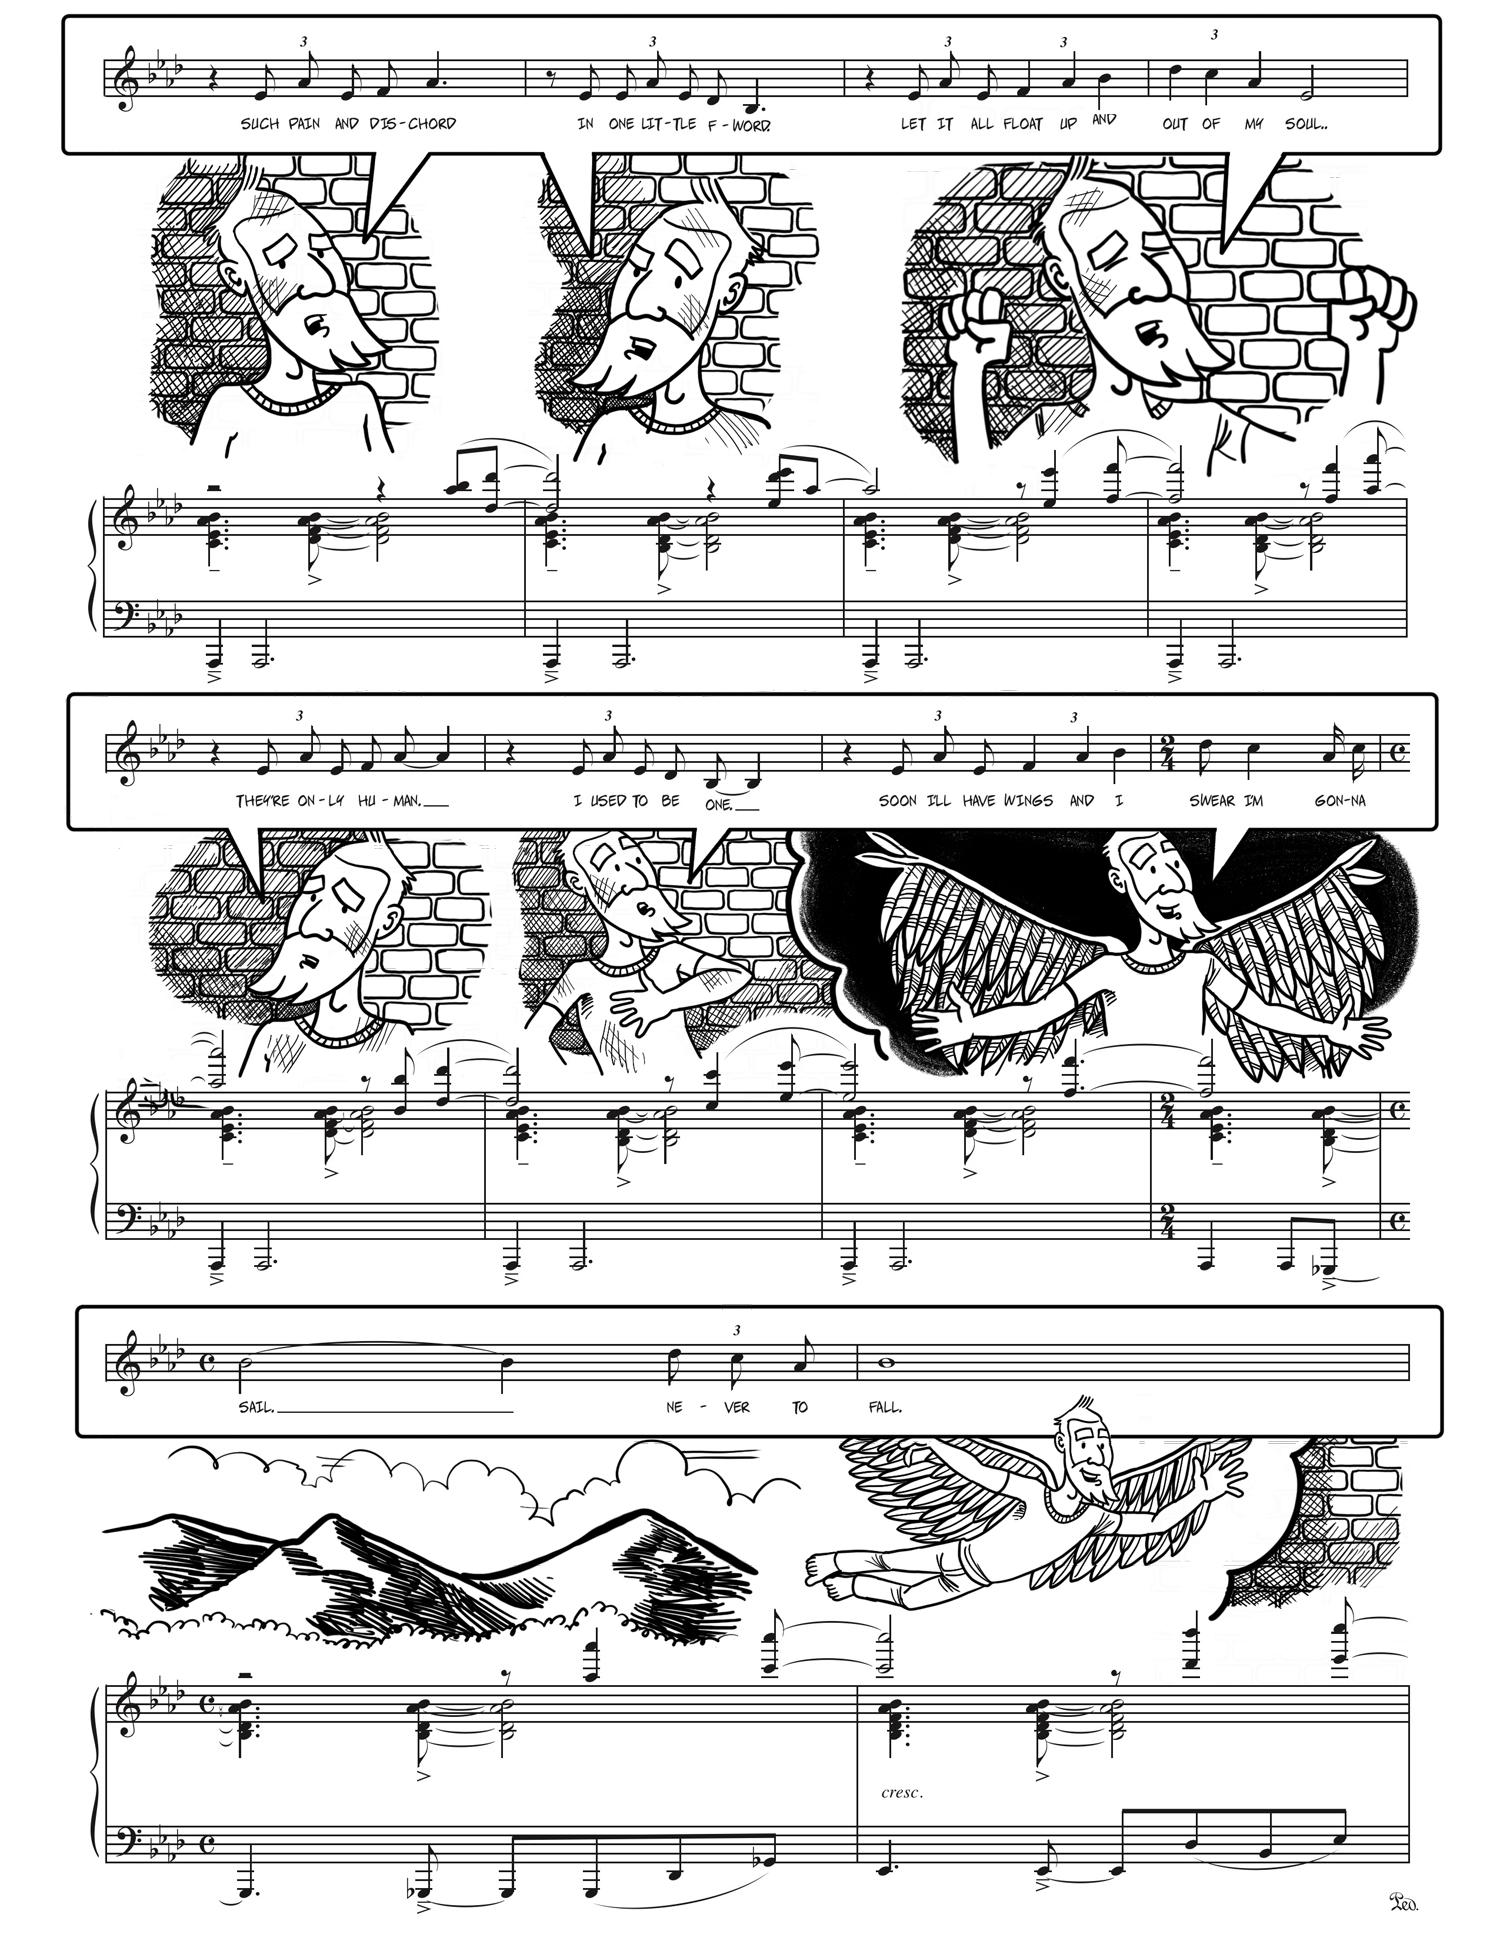 PAGE-248.jpg